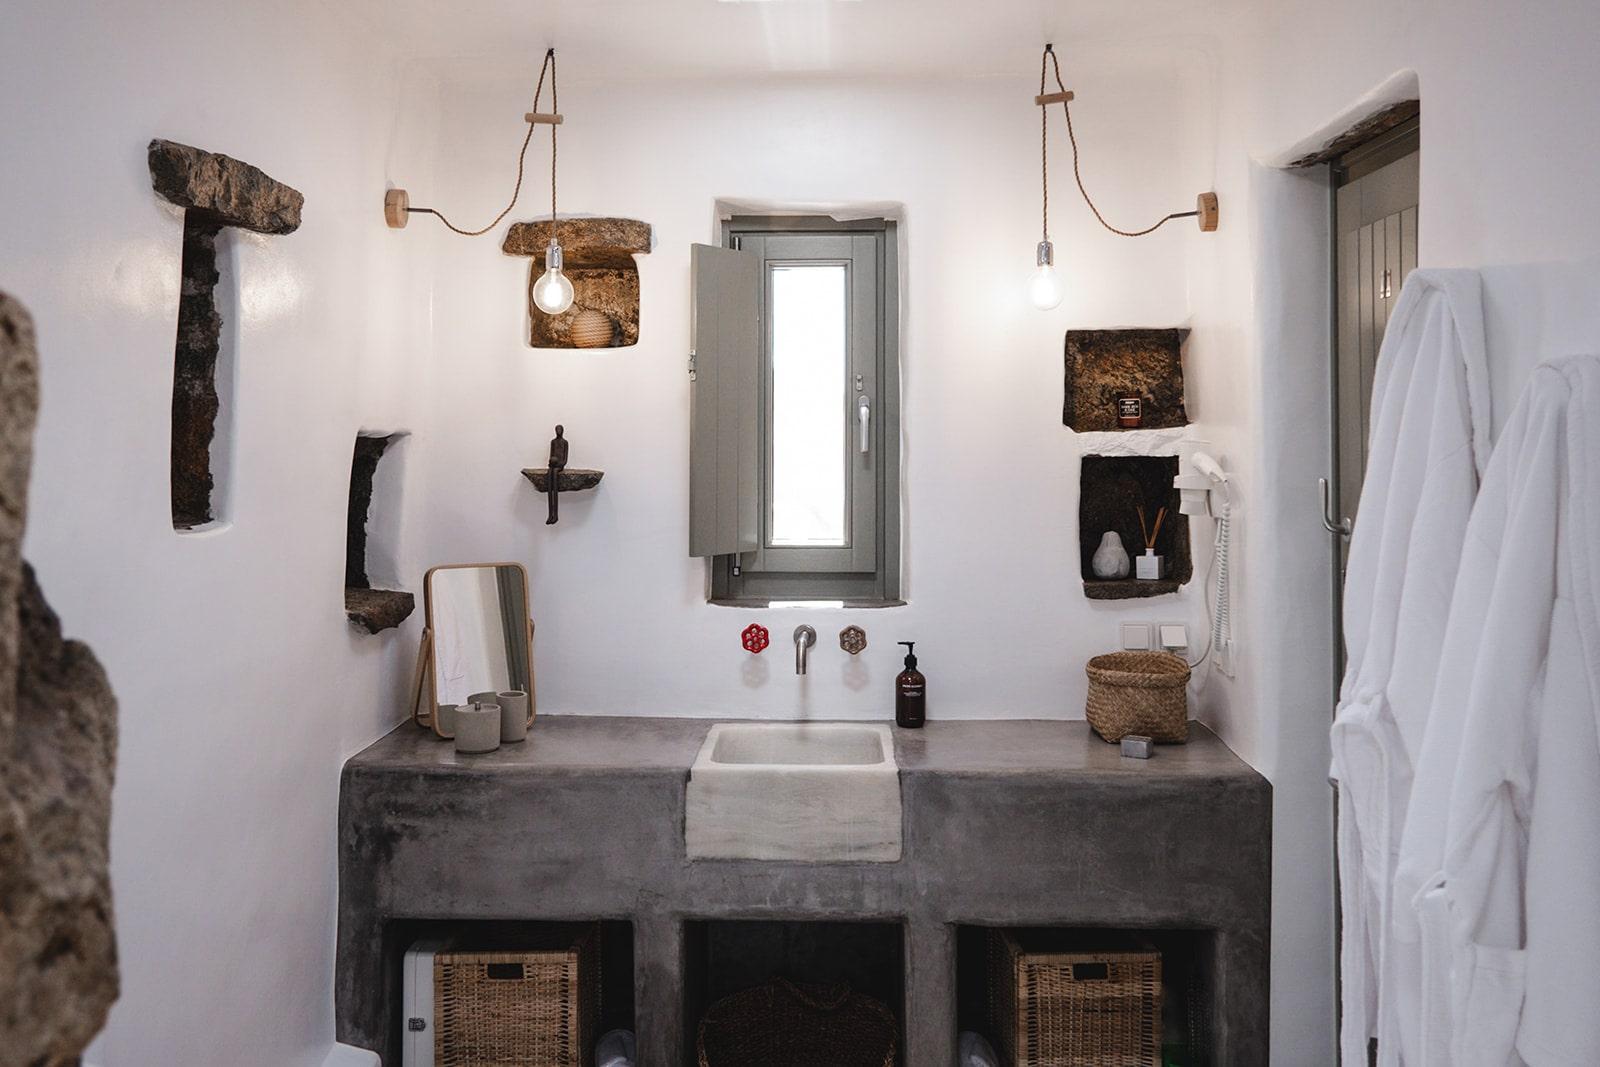 Keli Serifos bathroom with marble sink and Grown Alchemist toiletries